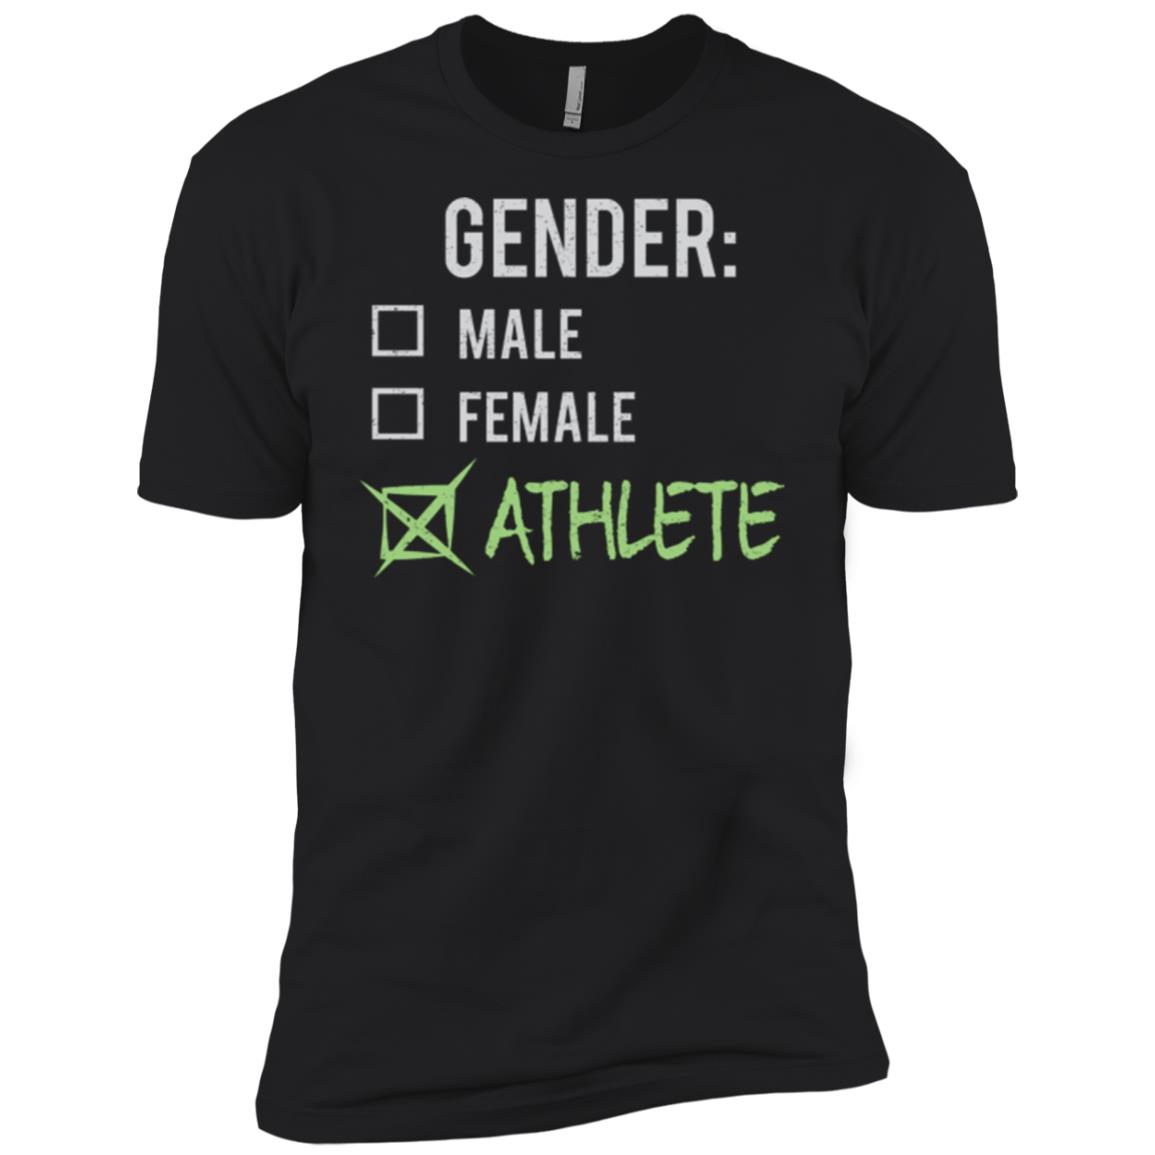 Male Female Athlete Gender Nonbinary Trans Men Short Sleeve T-Shirt